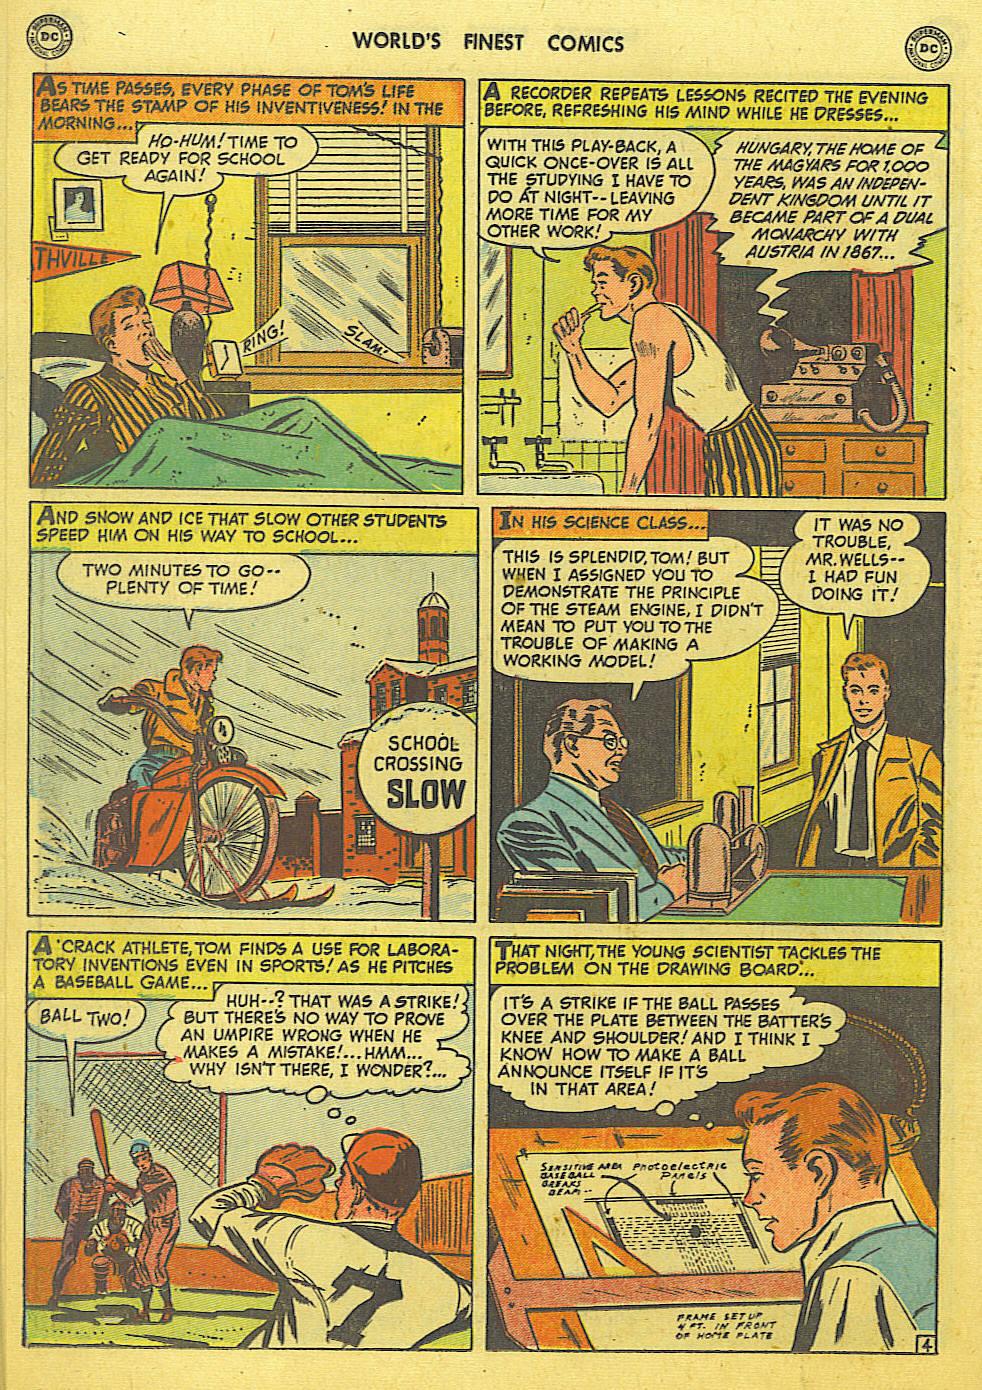 Read online World's Finest Comics comic -  Issue #49 - 33